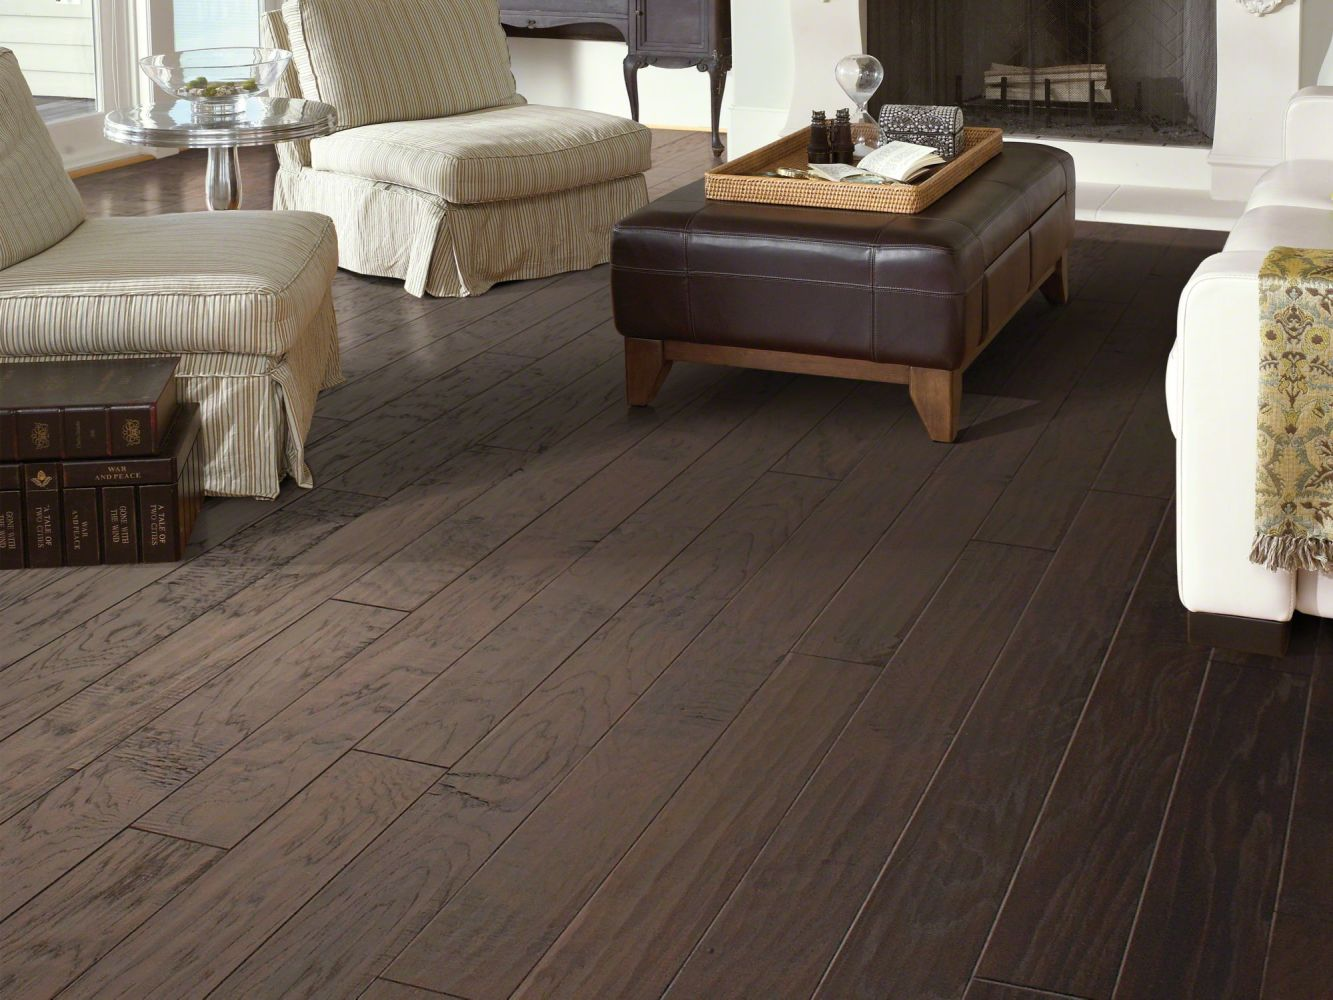 Shaw Floors Home Fn Gold Hardwood Nottoway Hickory II – 5″ Olde English 00885_HW612